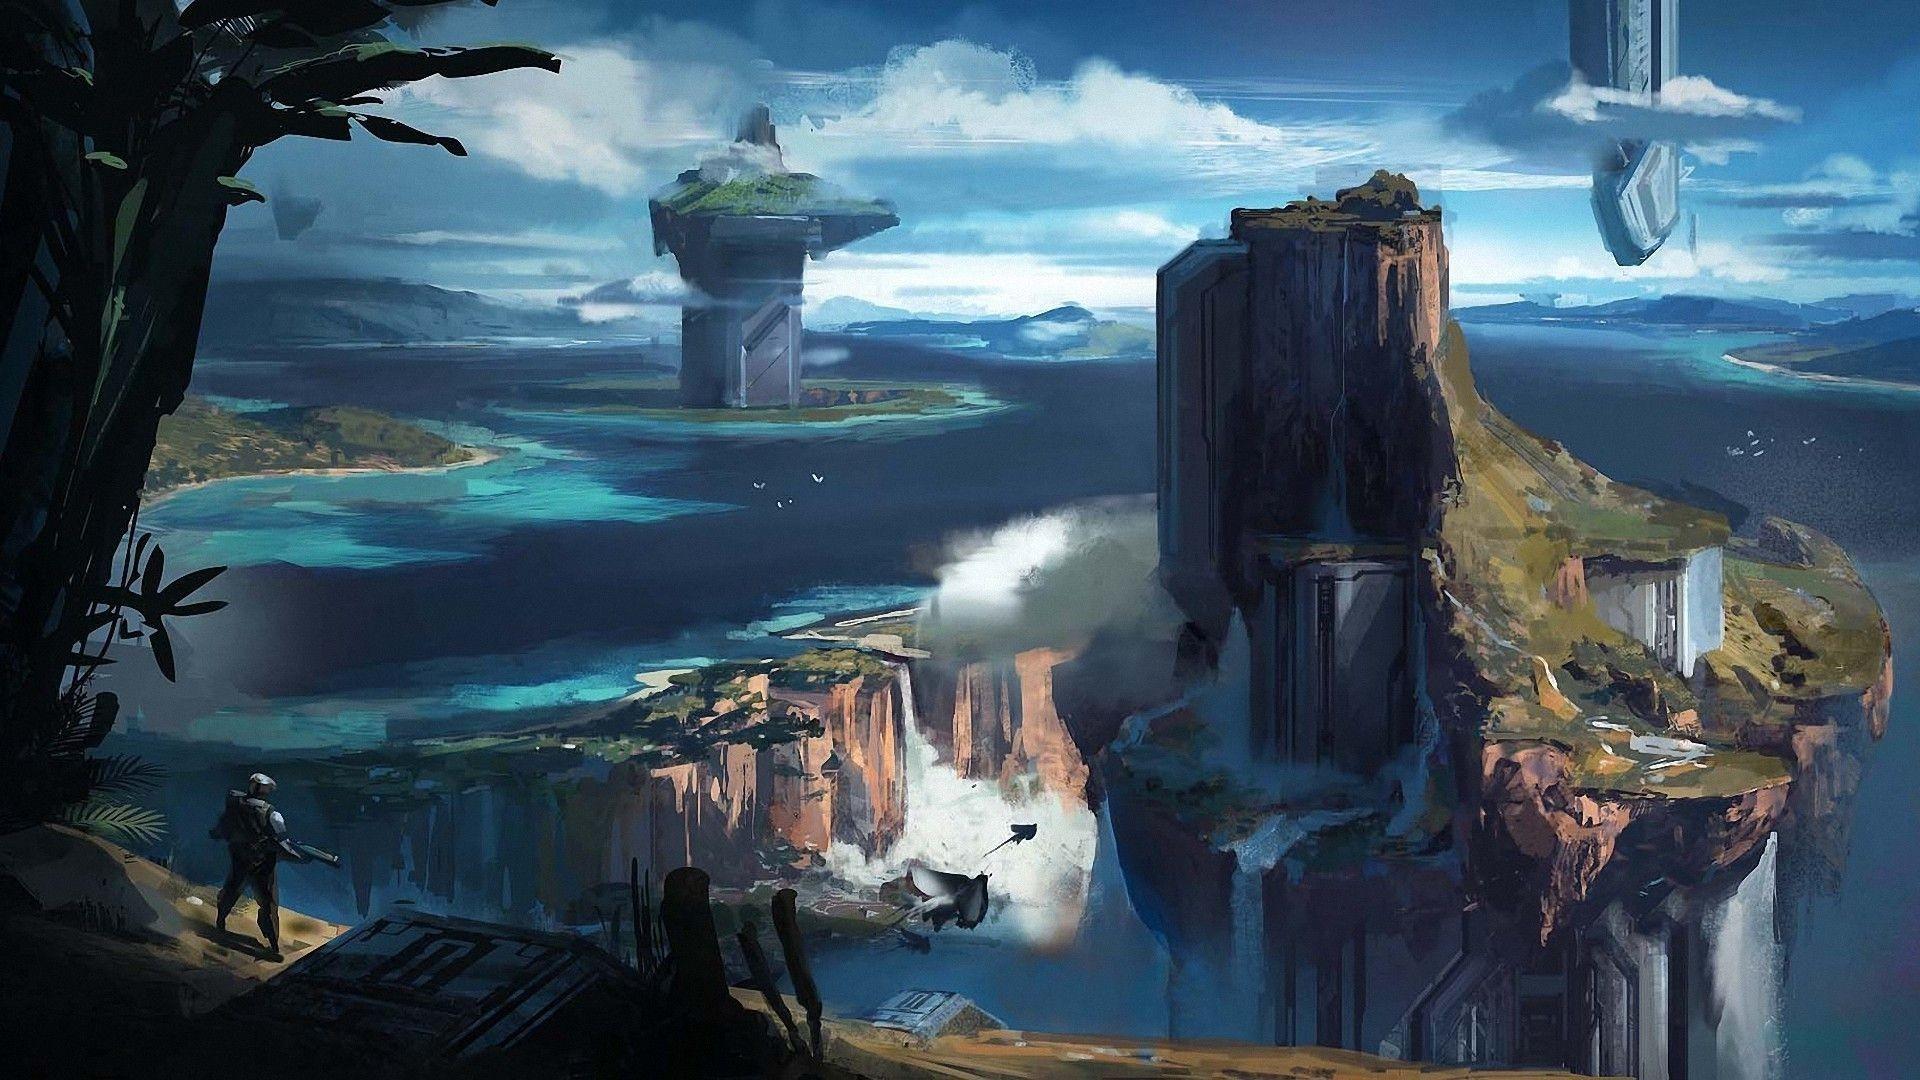 HD Sci Fi Fantasy Island Computer Wallpaper – HiReWallpapers 8009